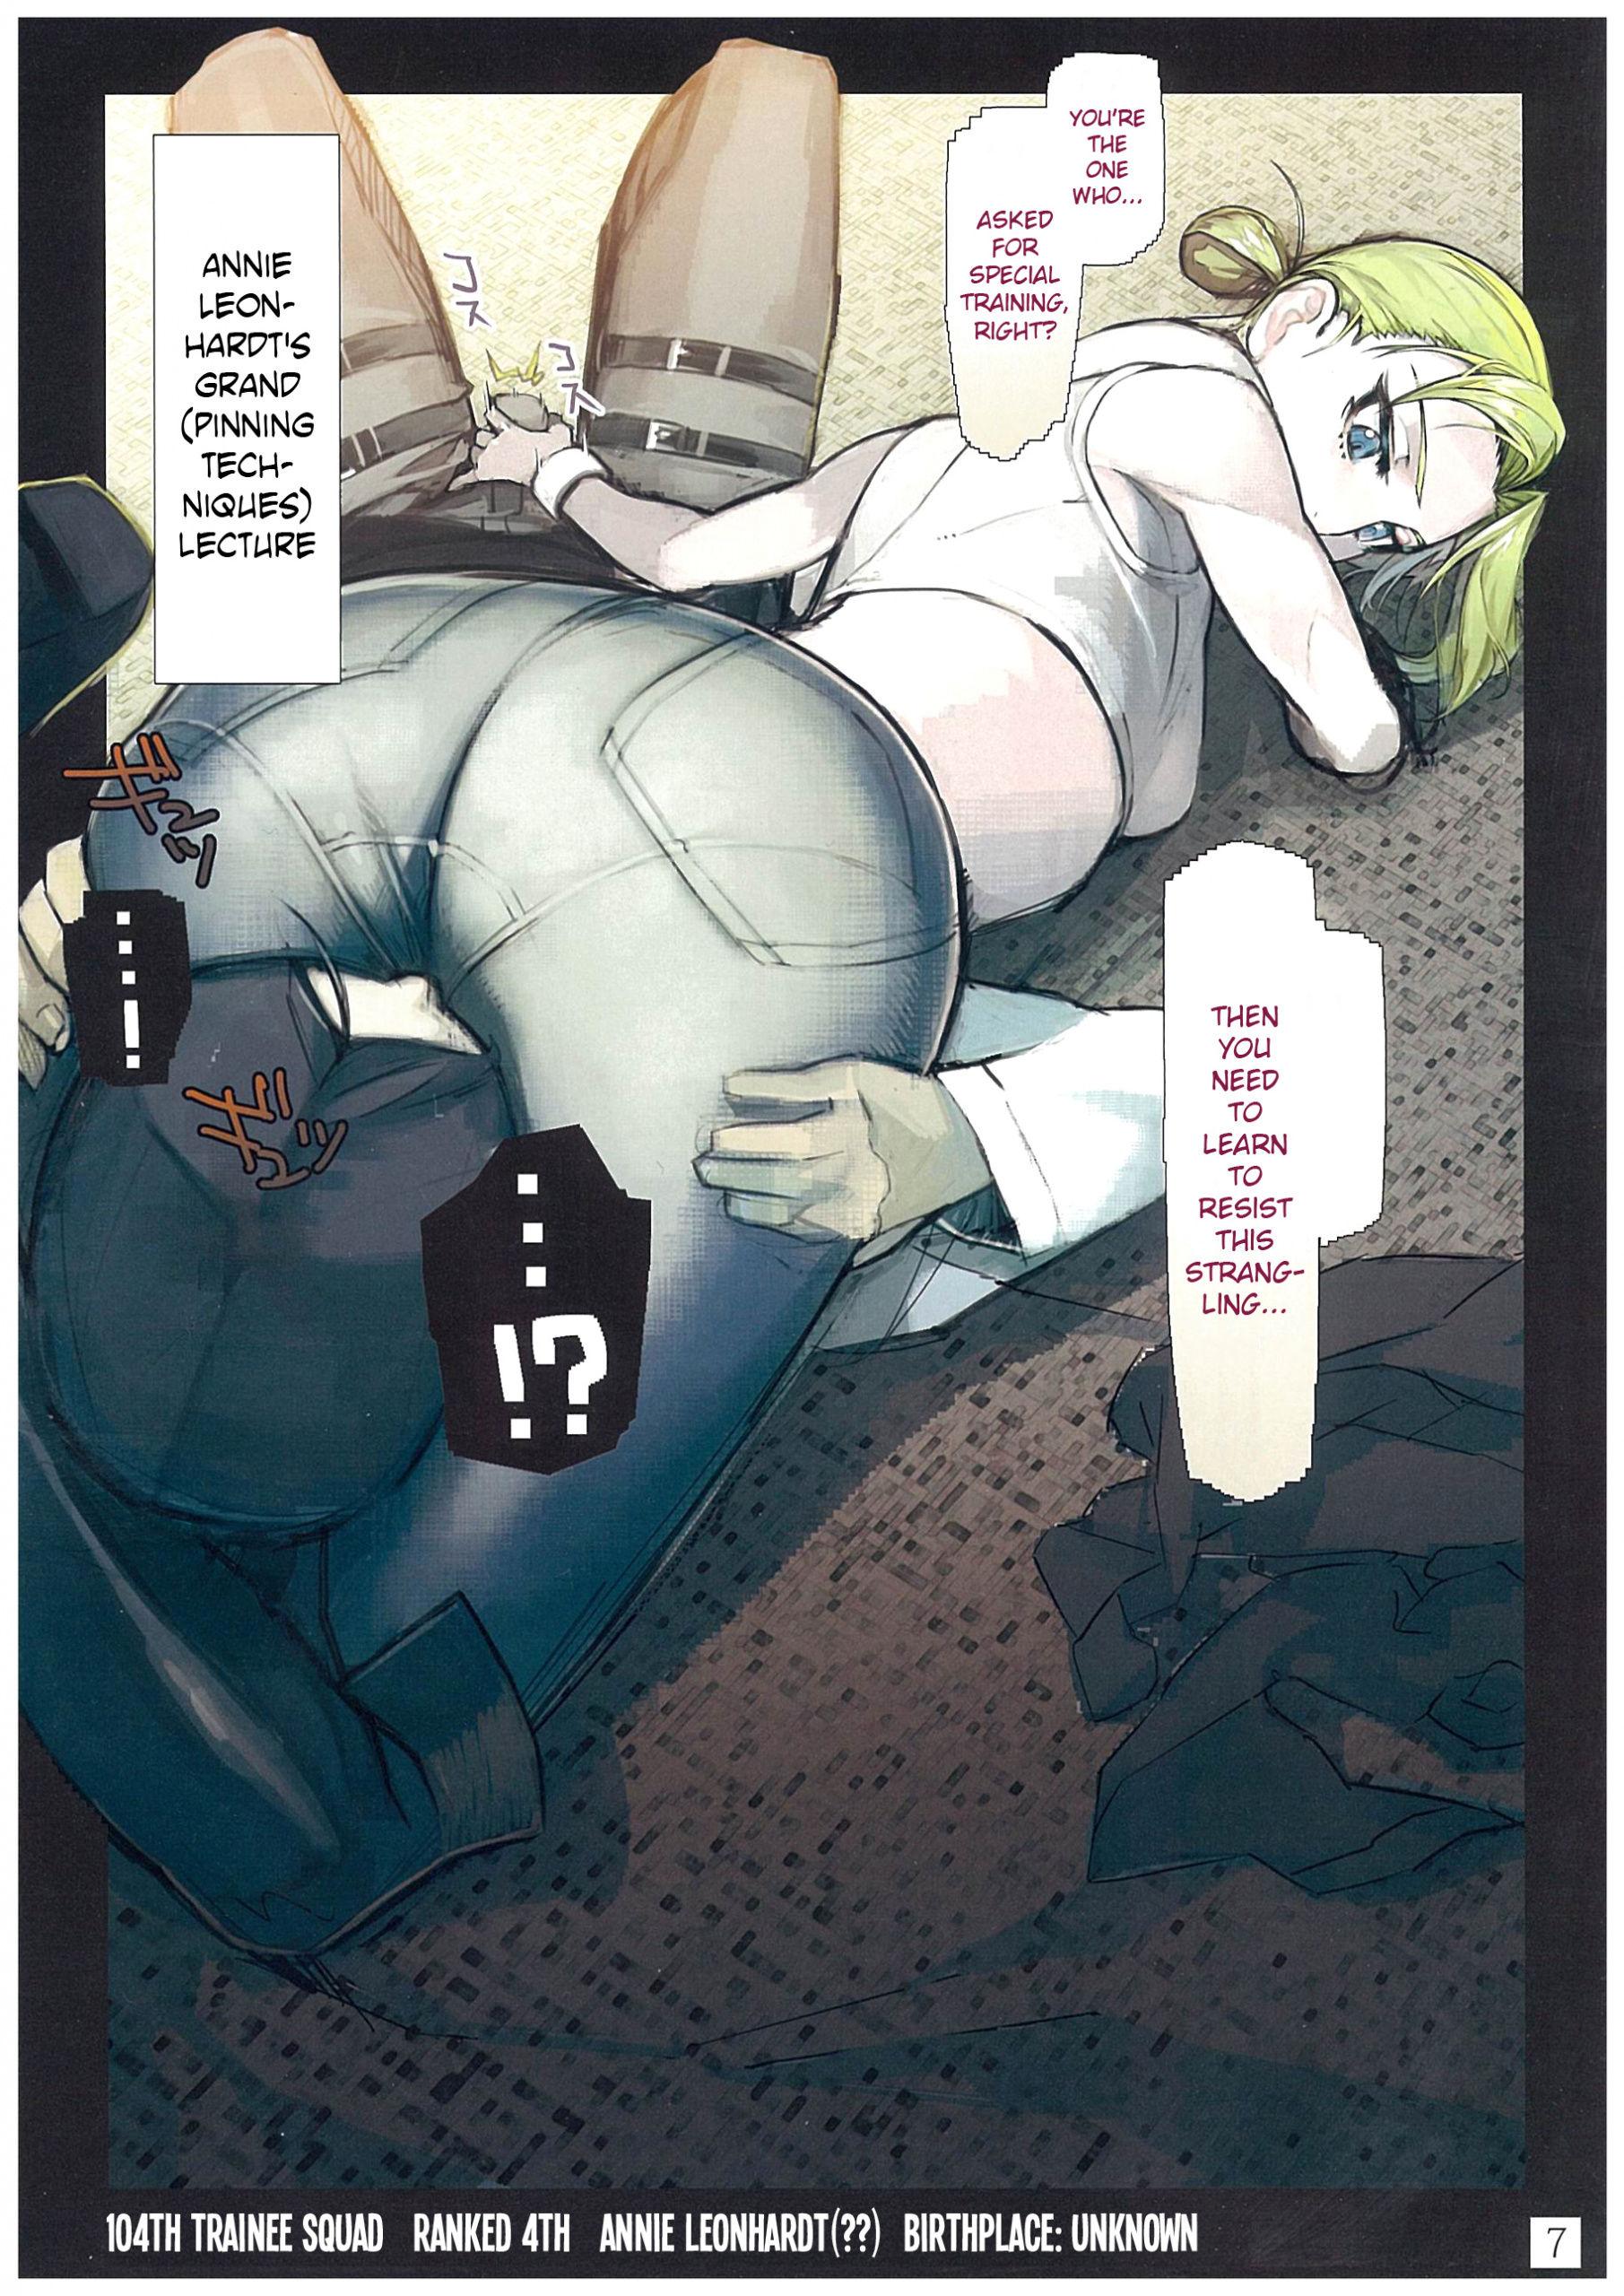 Shinngeki vol 3 hentai manga picture 05